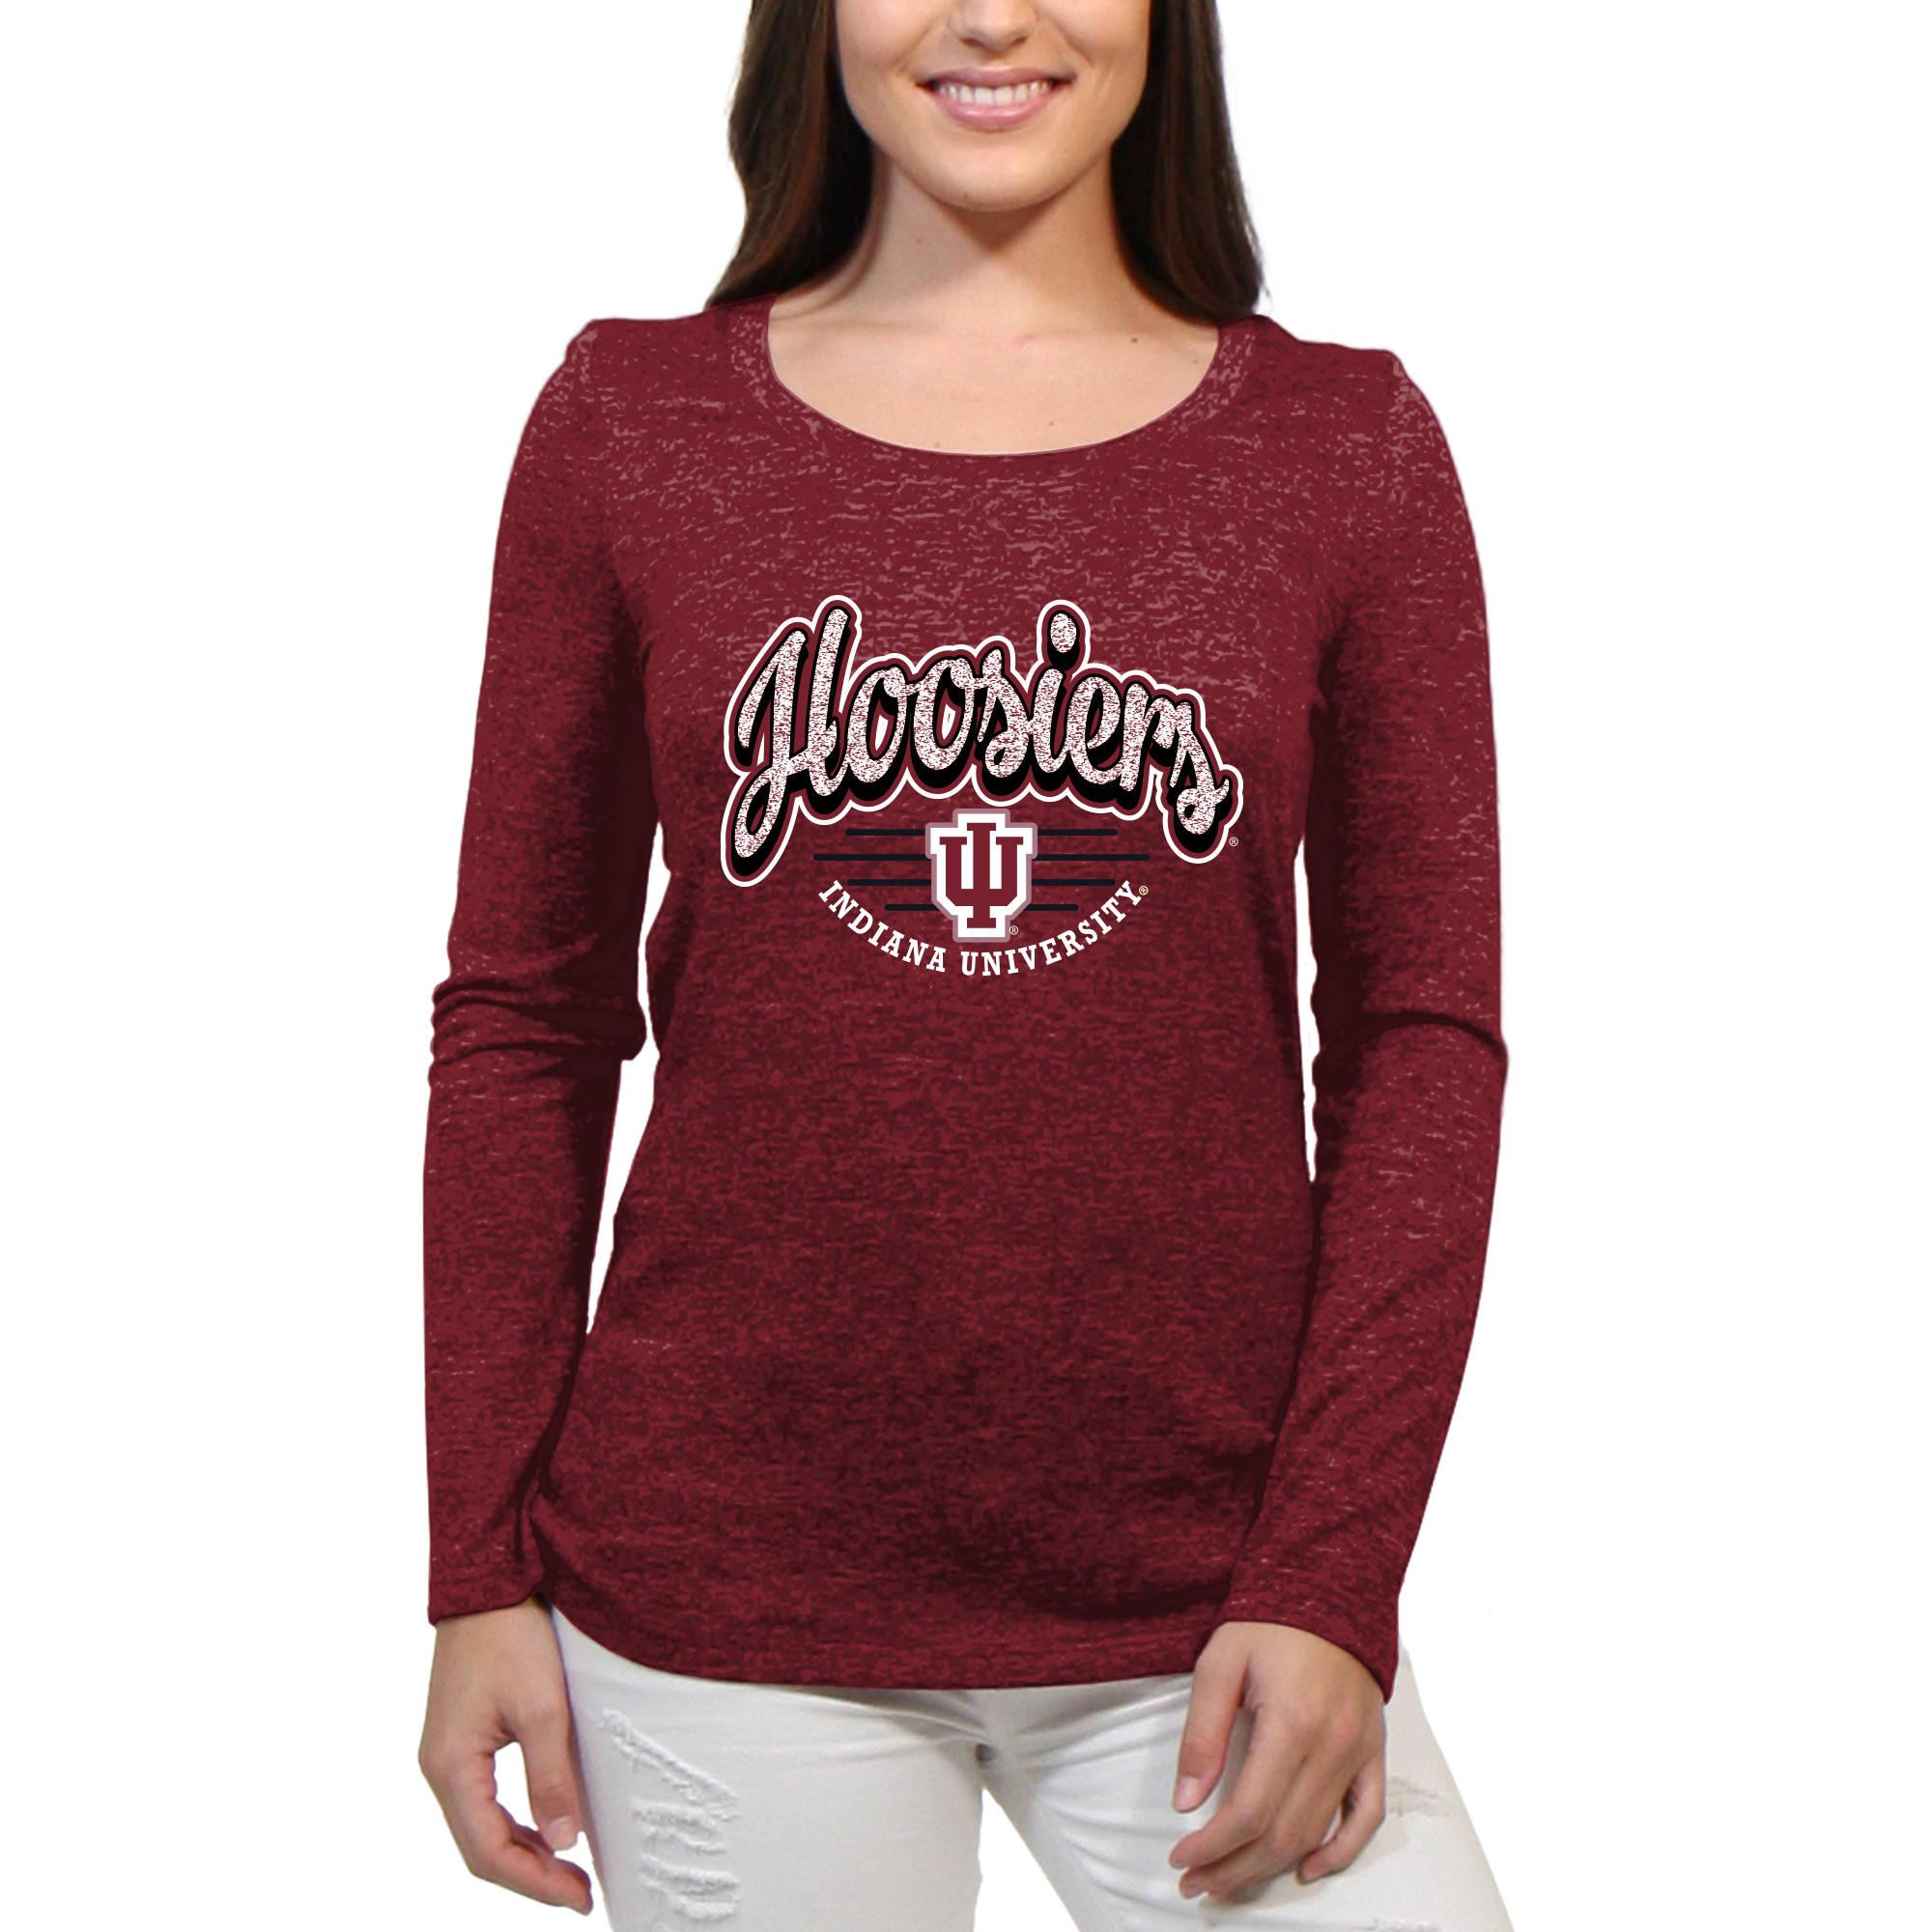 Indiana Hoosiers Funky Script Women'S/Juniors Team Long Sleeve Scoop Neck Shirt